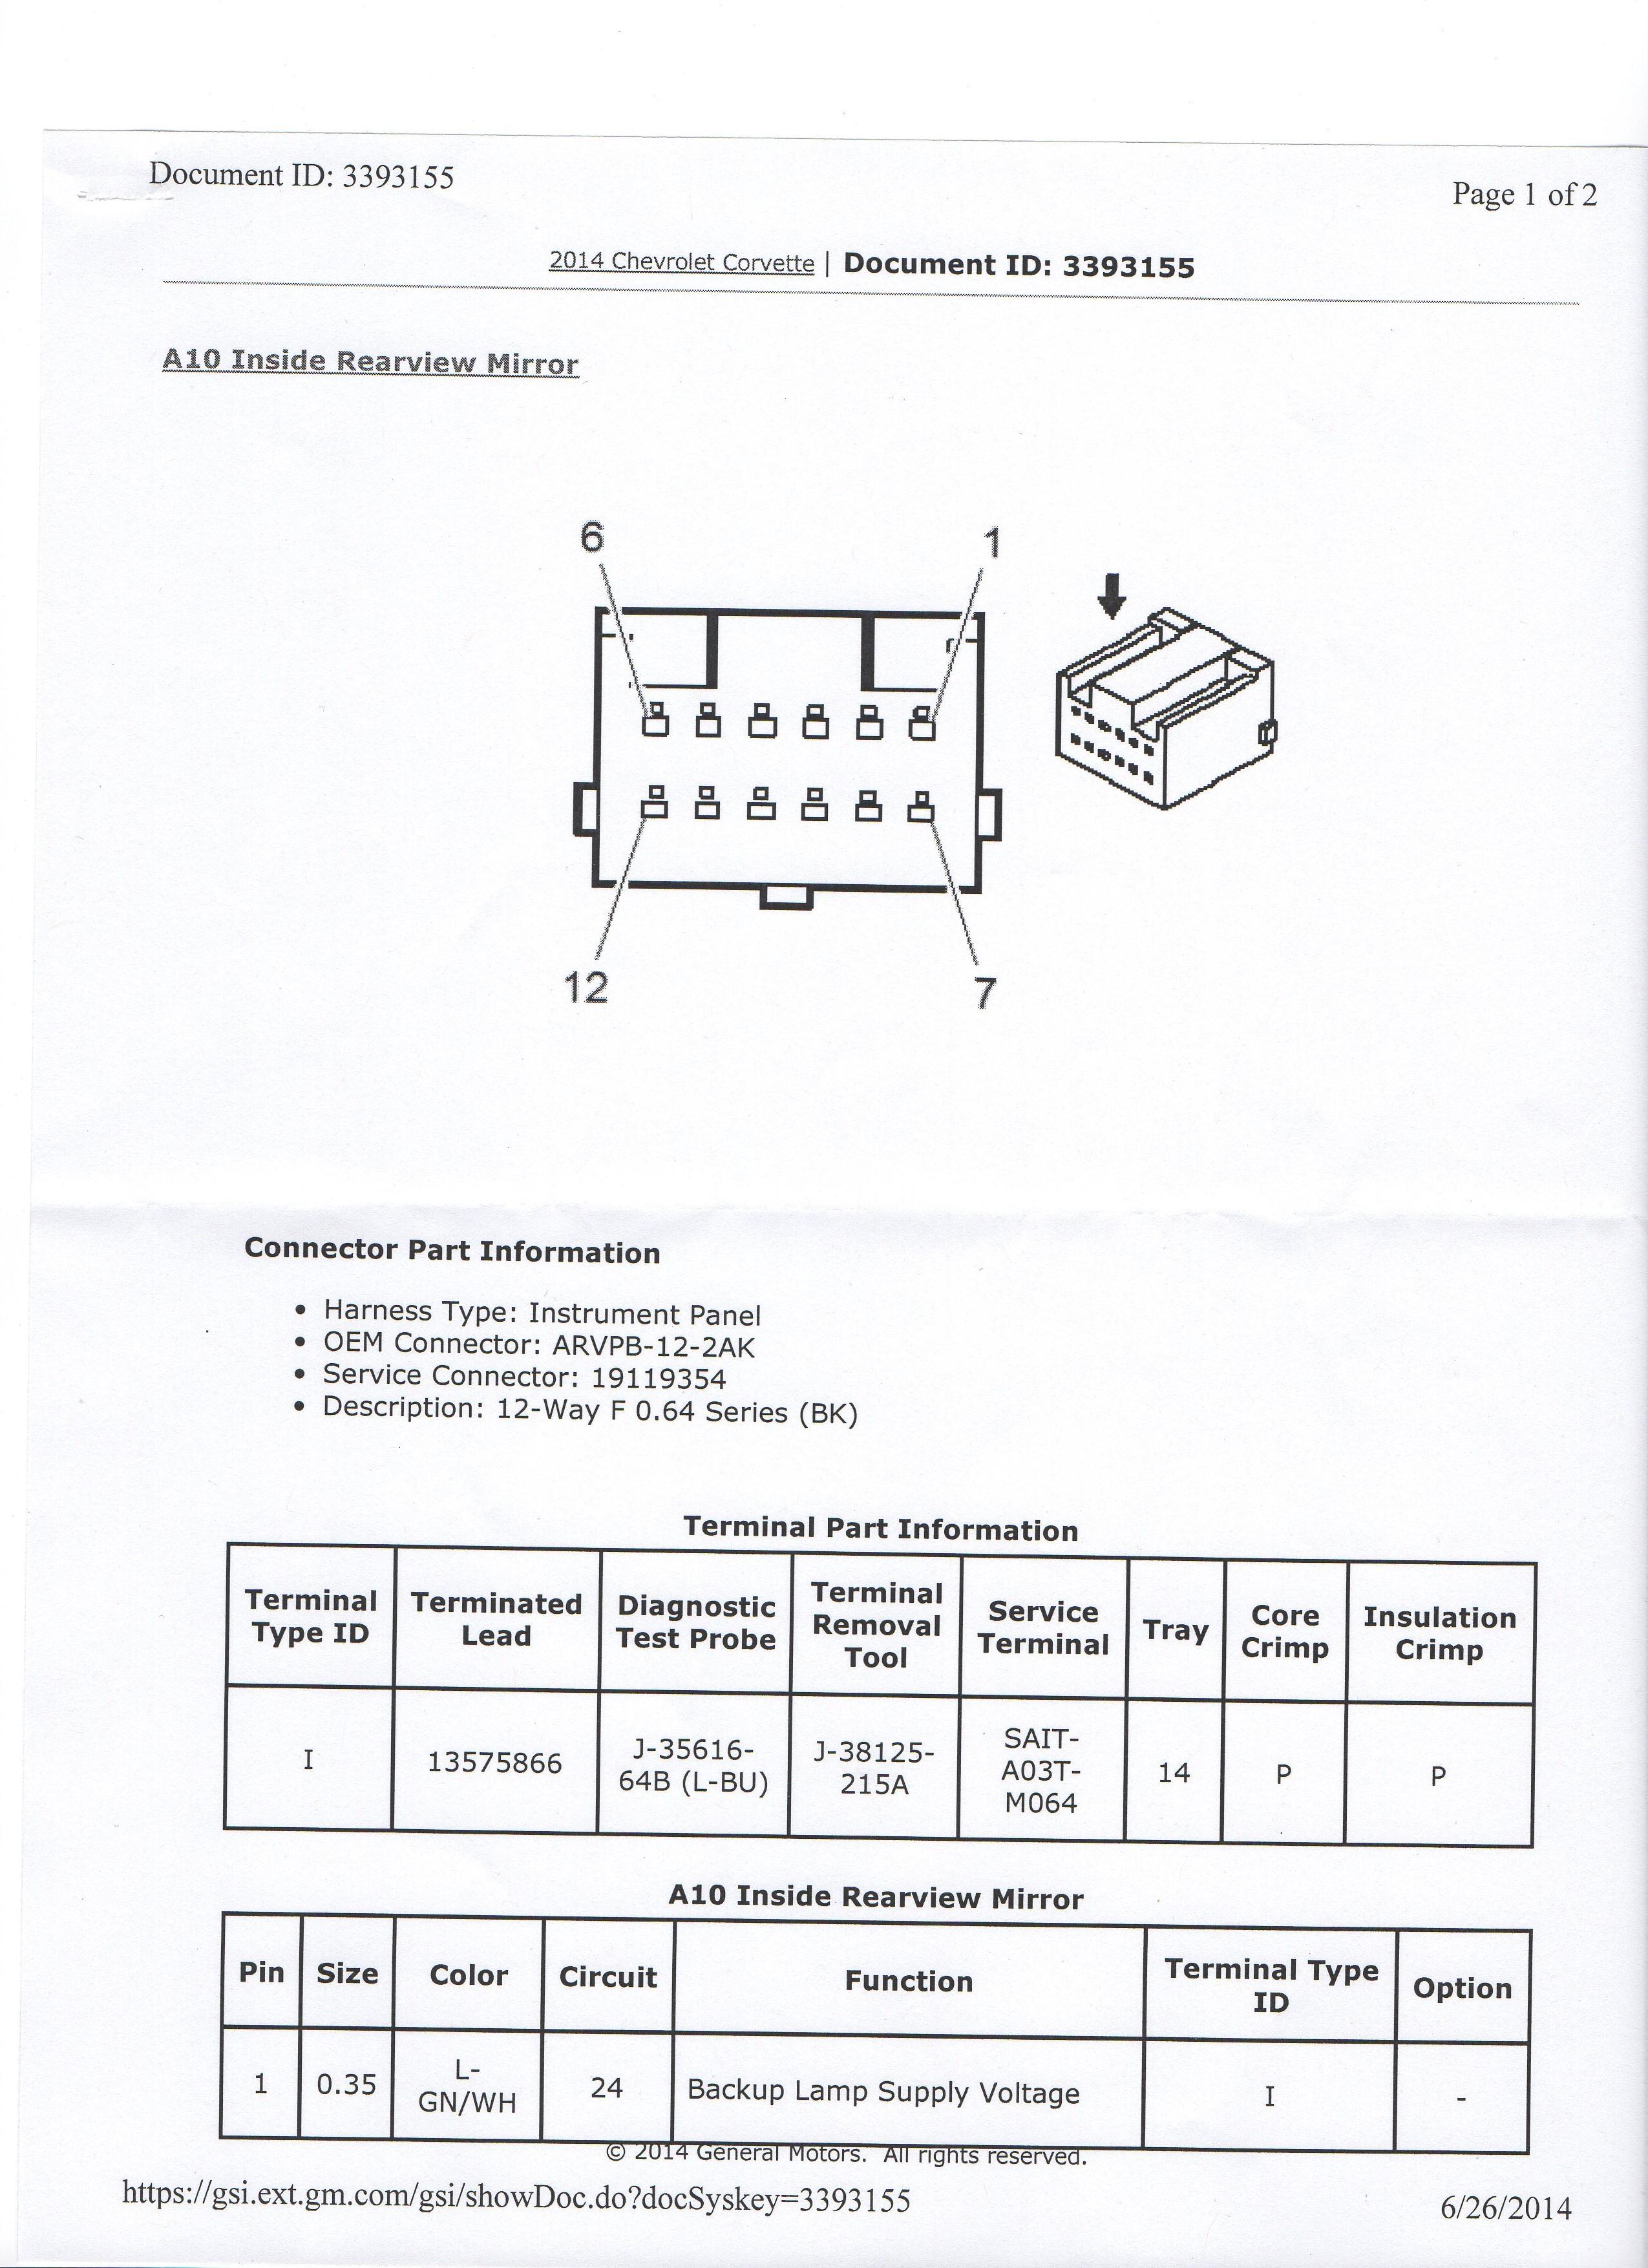 Update From Blendmount On C7 Radar Detector Mount